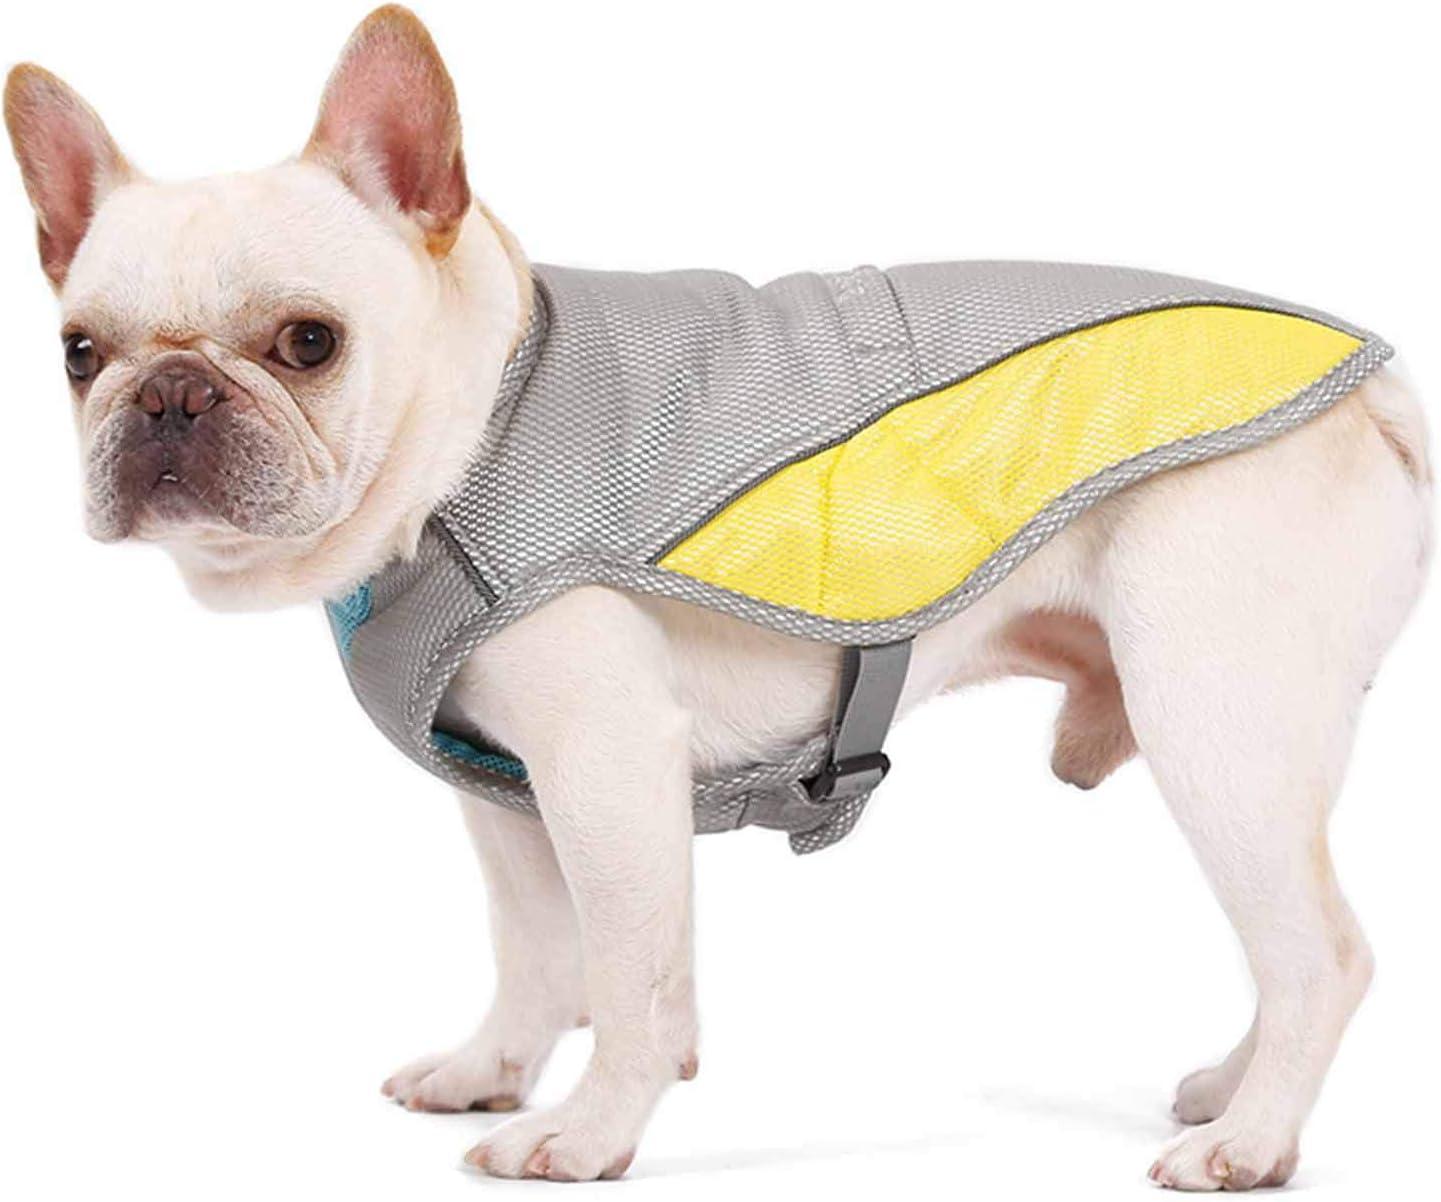 NINOMI Chaqueta de Chaleco frío para Perro Traje de enfriamiento de Golpe de Calor para Mascotas Transpirable de Verano Chaqueta de Ropa para Mascotas,L